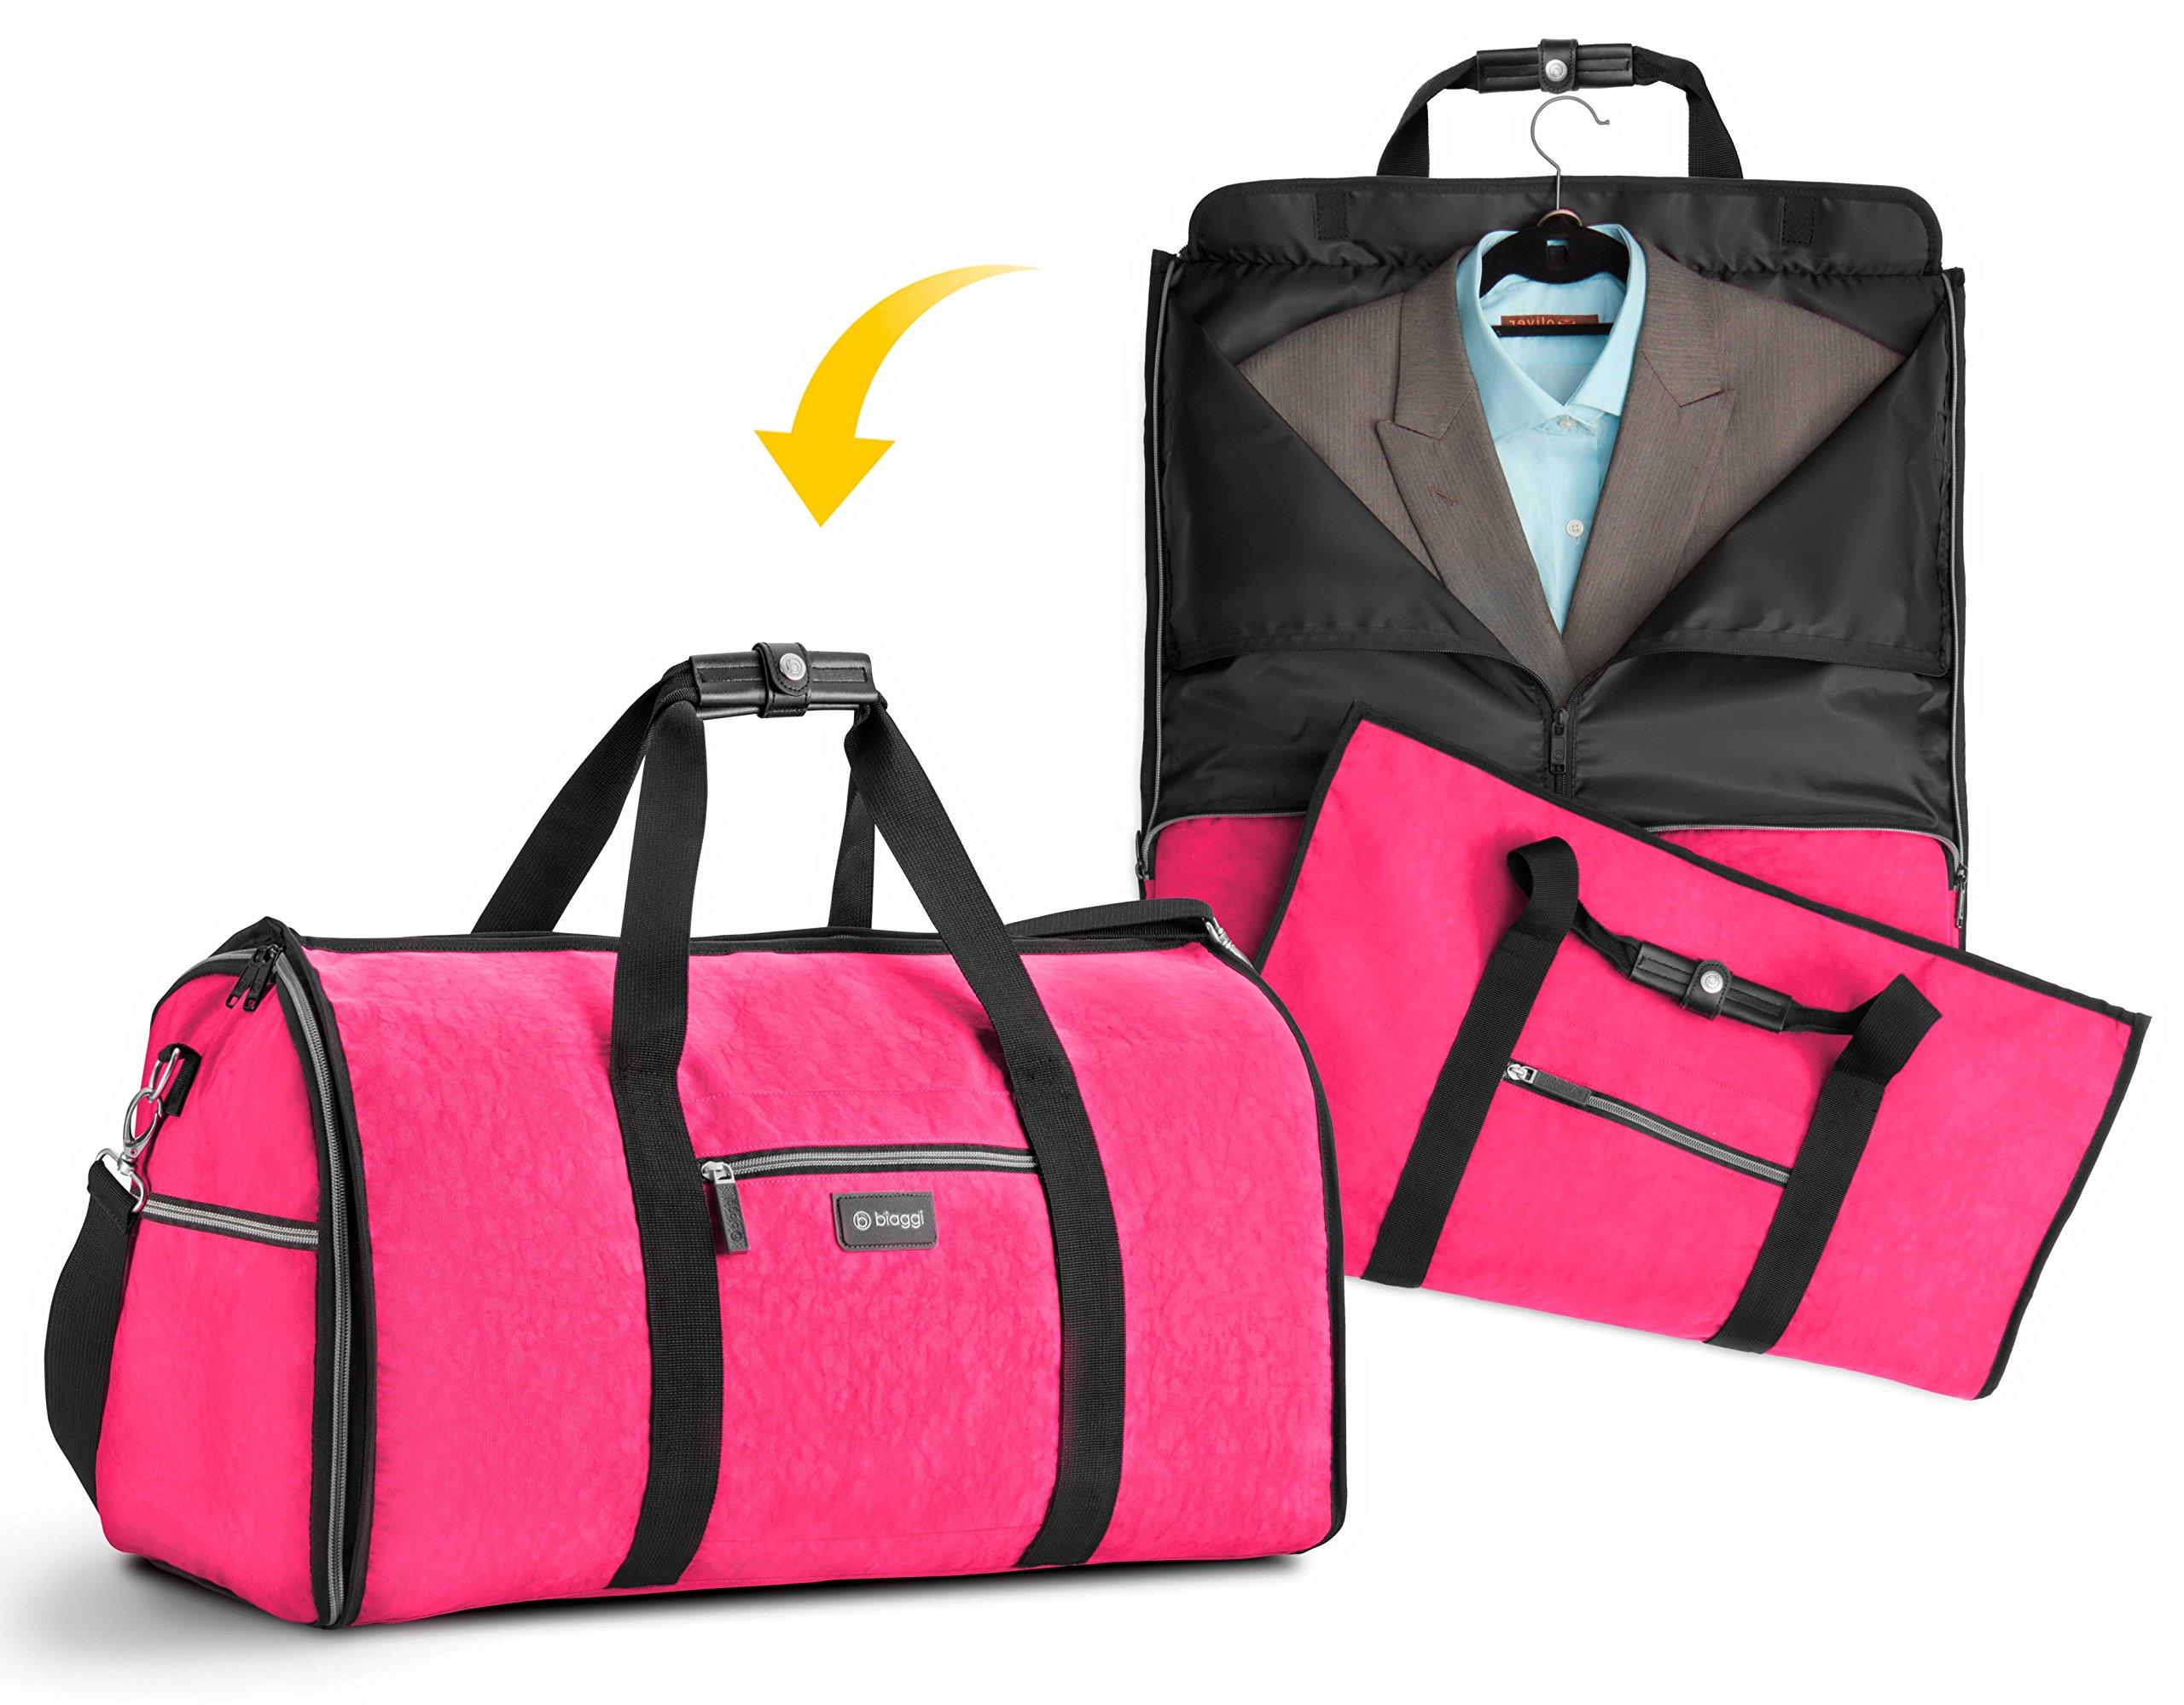 Biaggi Hangeroo Garment Bag+Duffel (One Size, Pink)